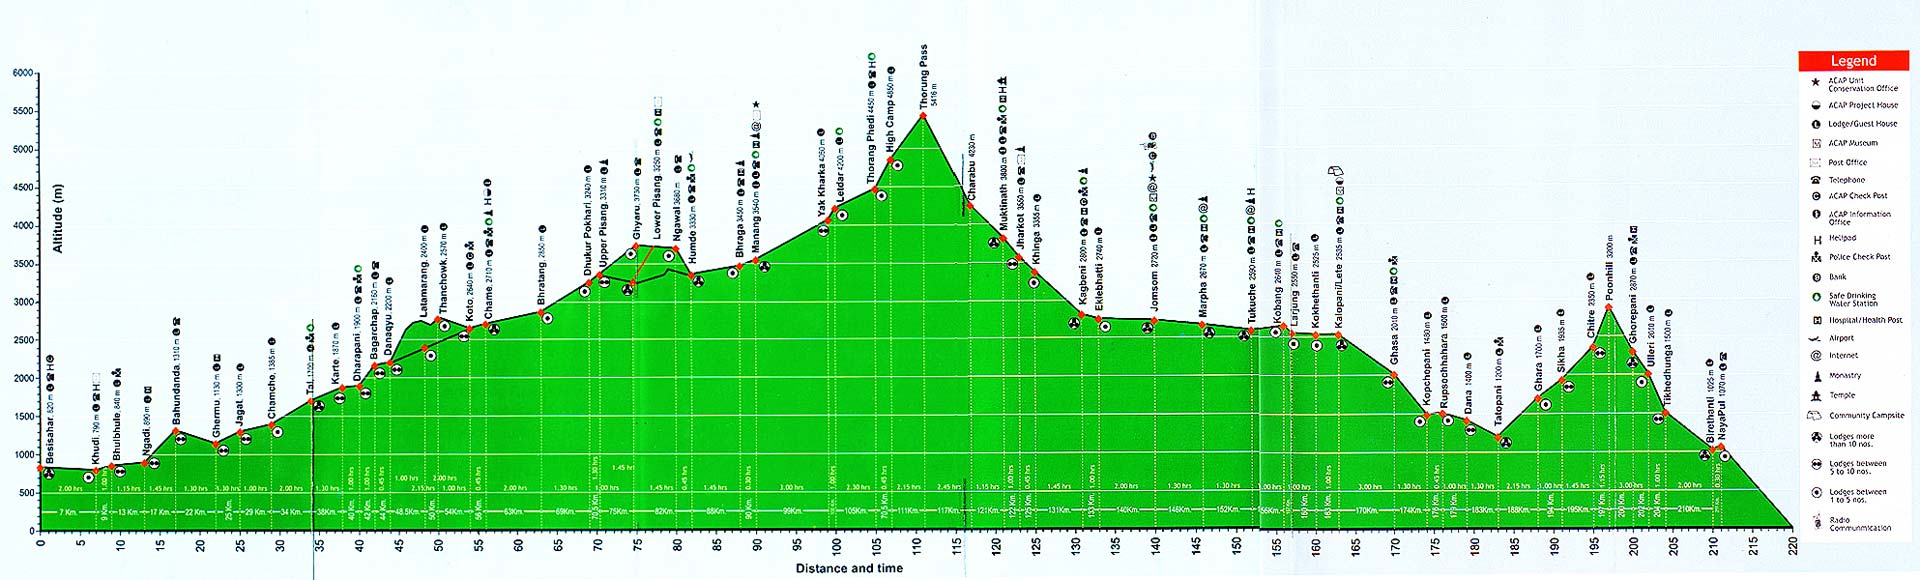 Annapurna Circuit: Höhenprofil Trekking Karte